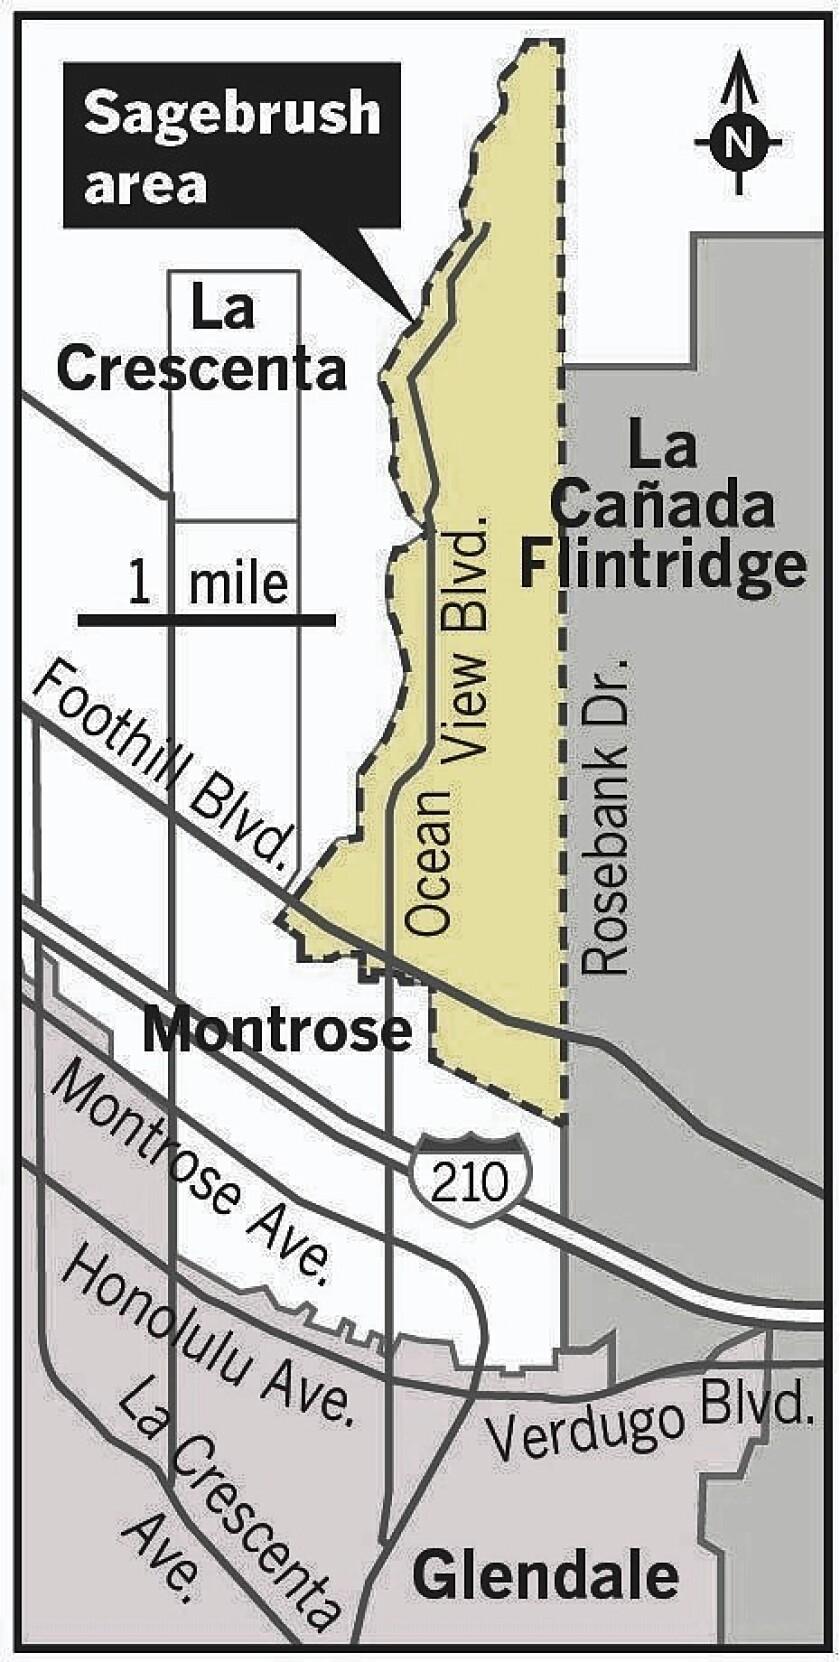 Sagebrush map